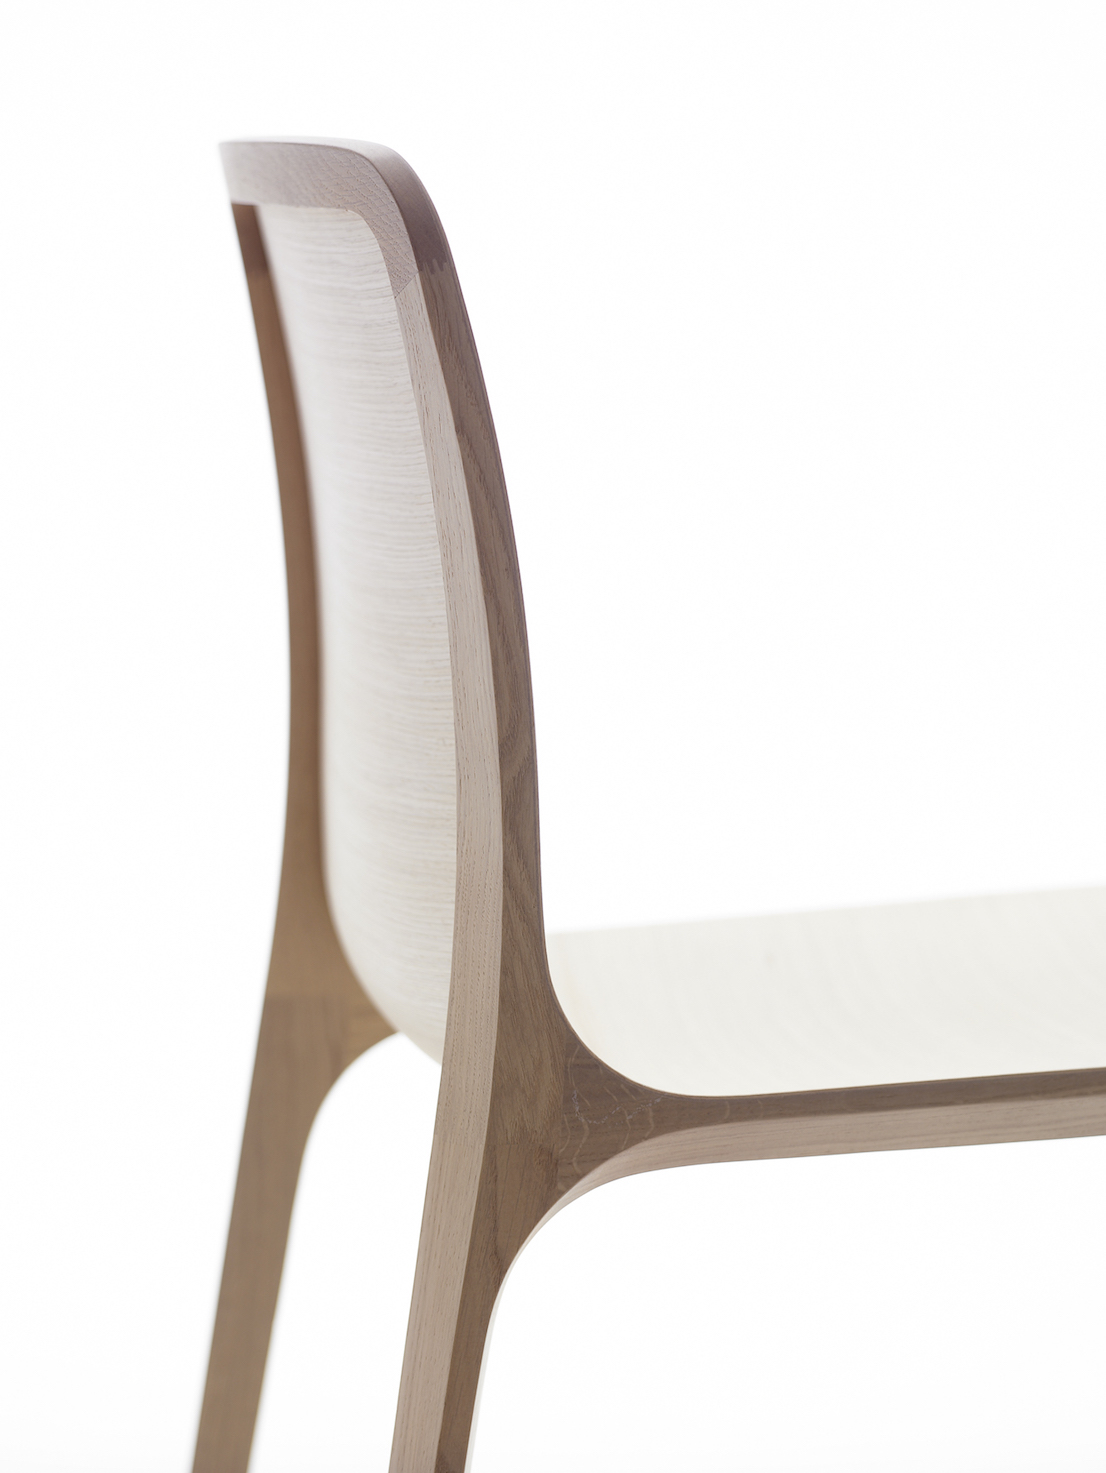 Frida, design di Odoardo Fioravanti per Pedrali, 2008.